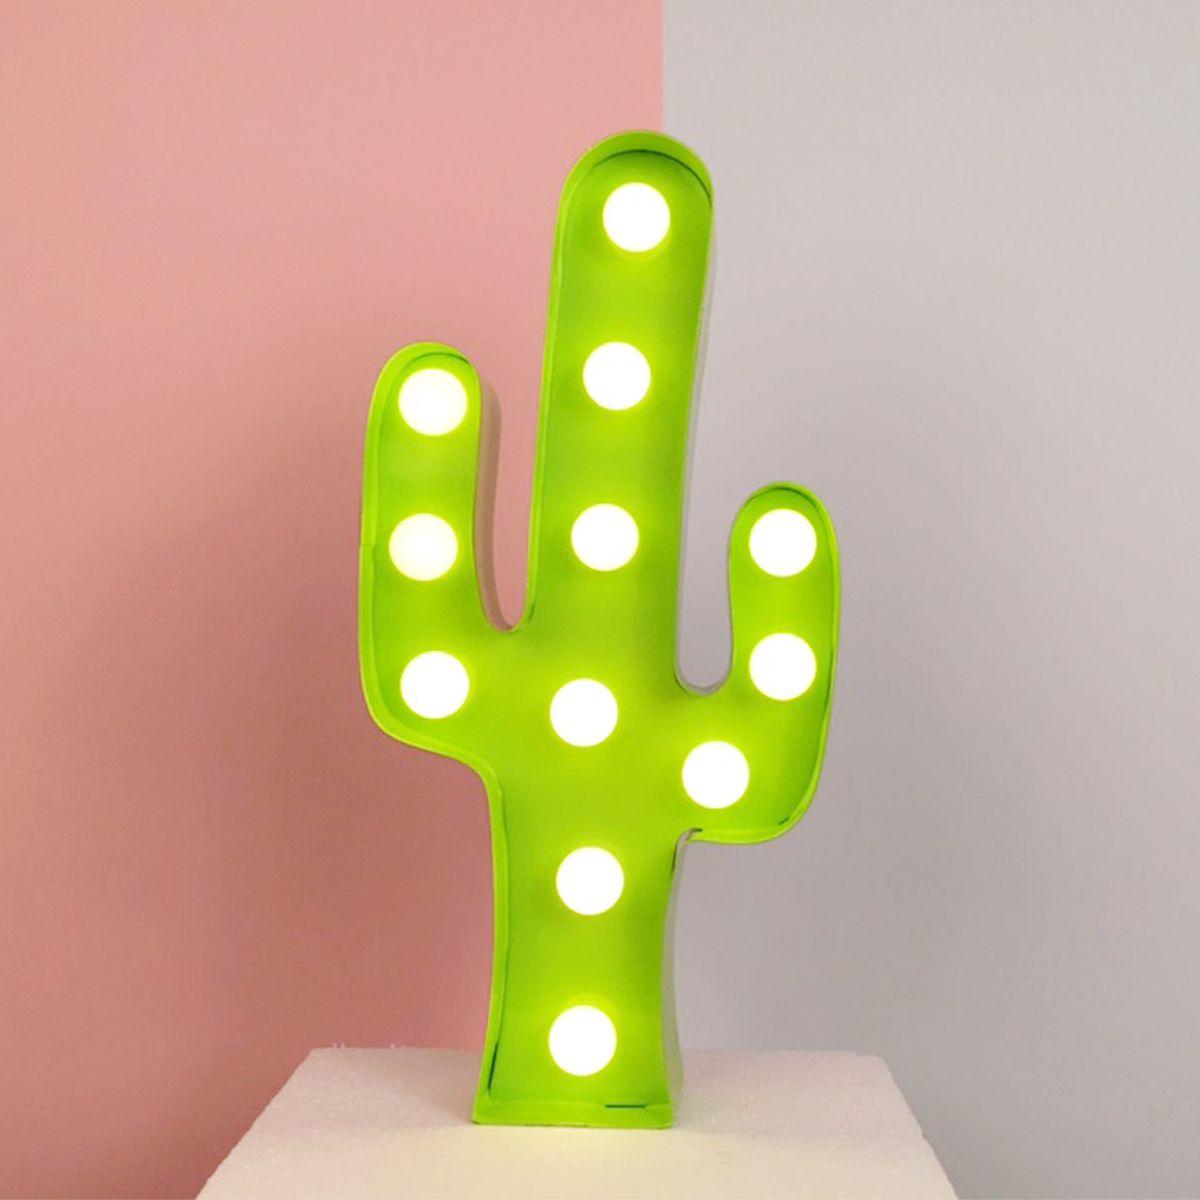 kaktus lampe kalt abbild oder edefaca